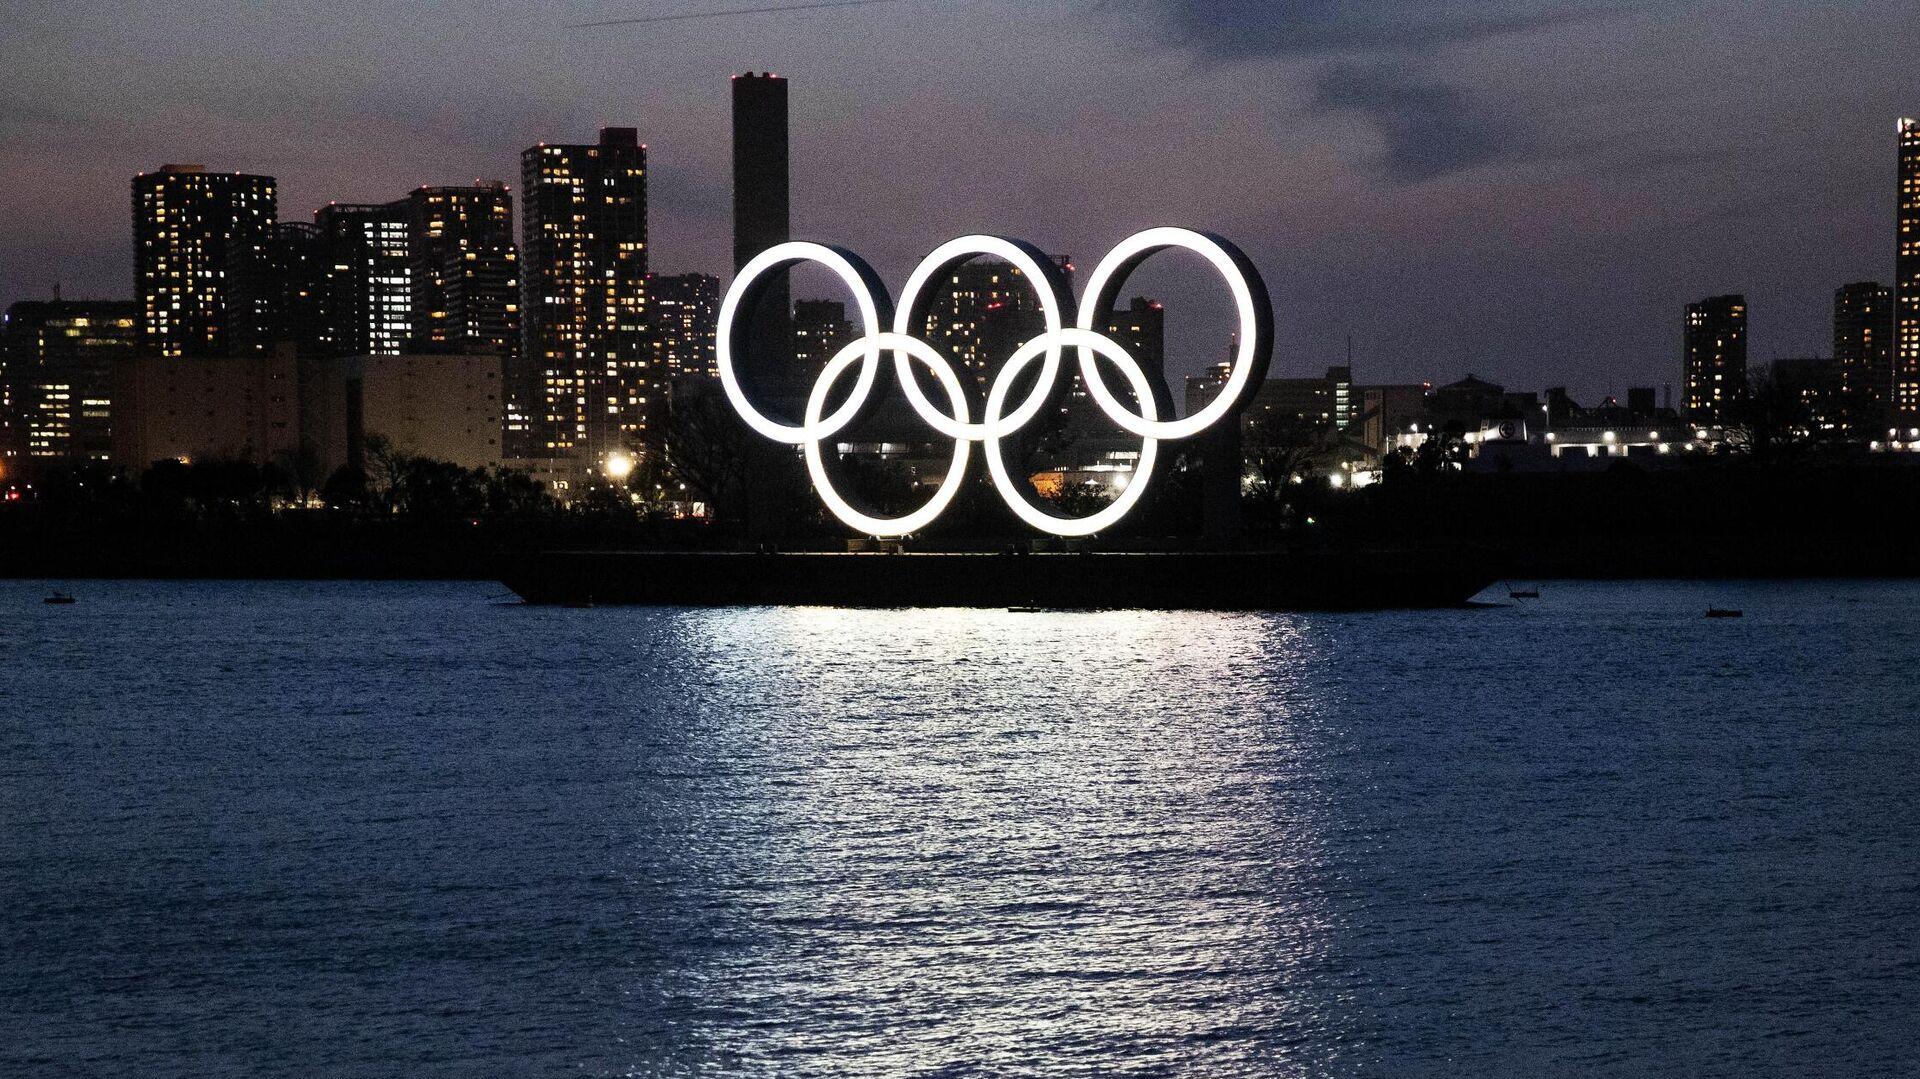 Олимпийские кольца в Токио - РИА Новости, 1920, 10.05.2021